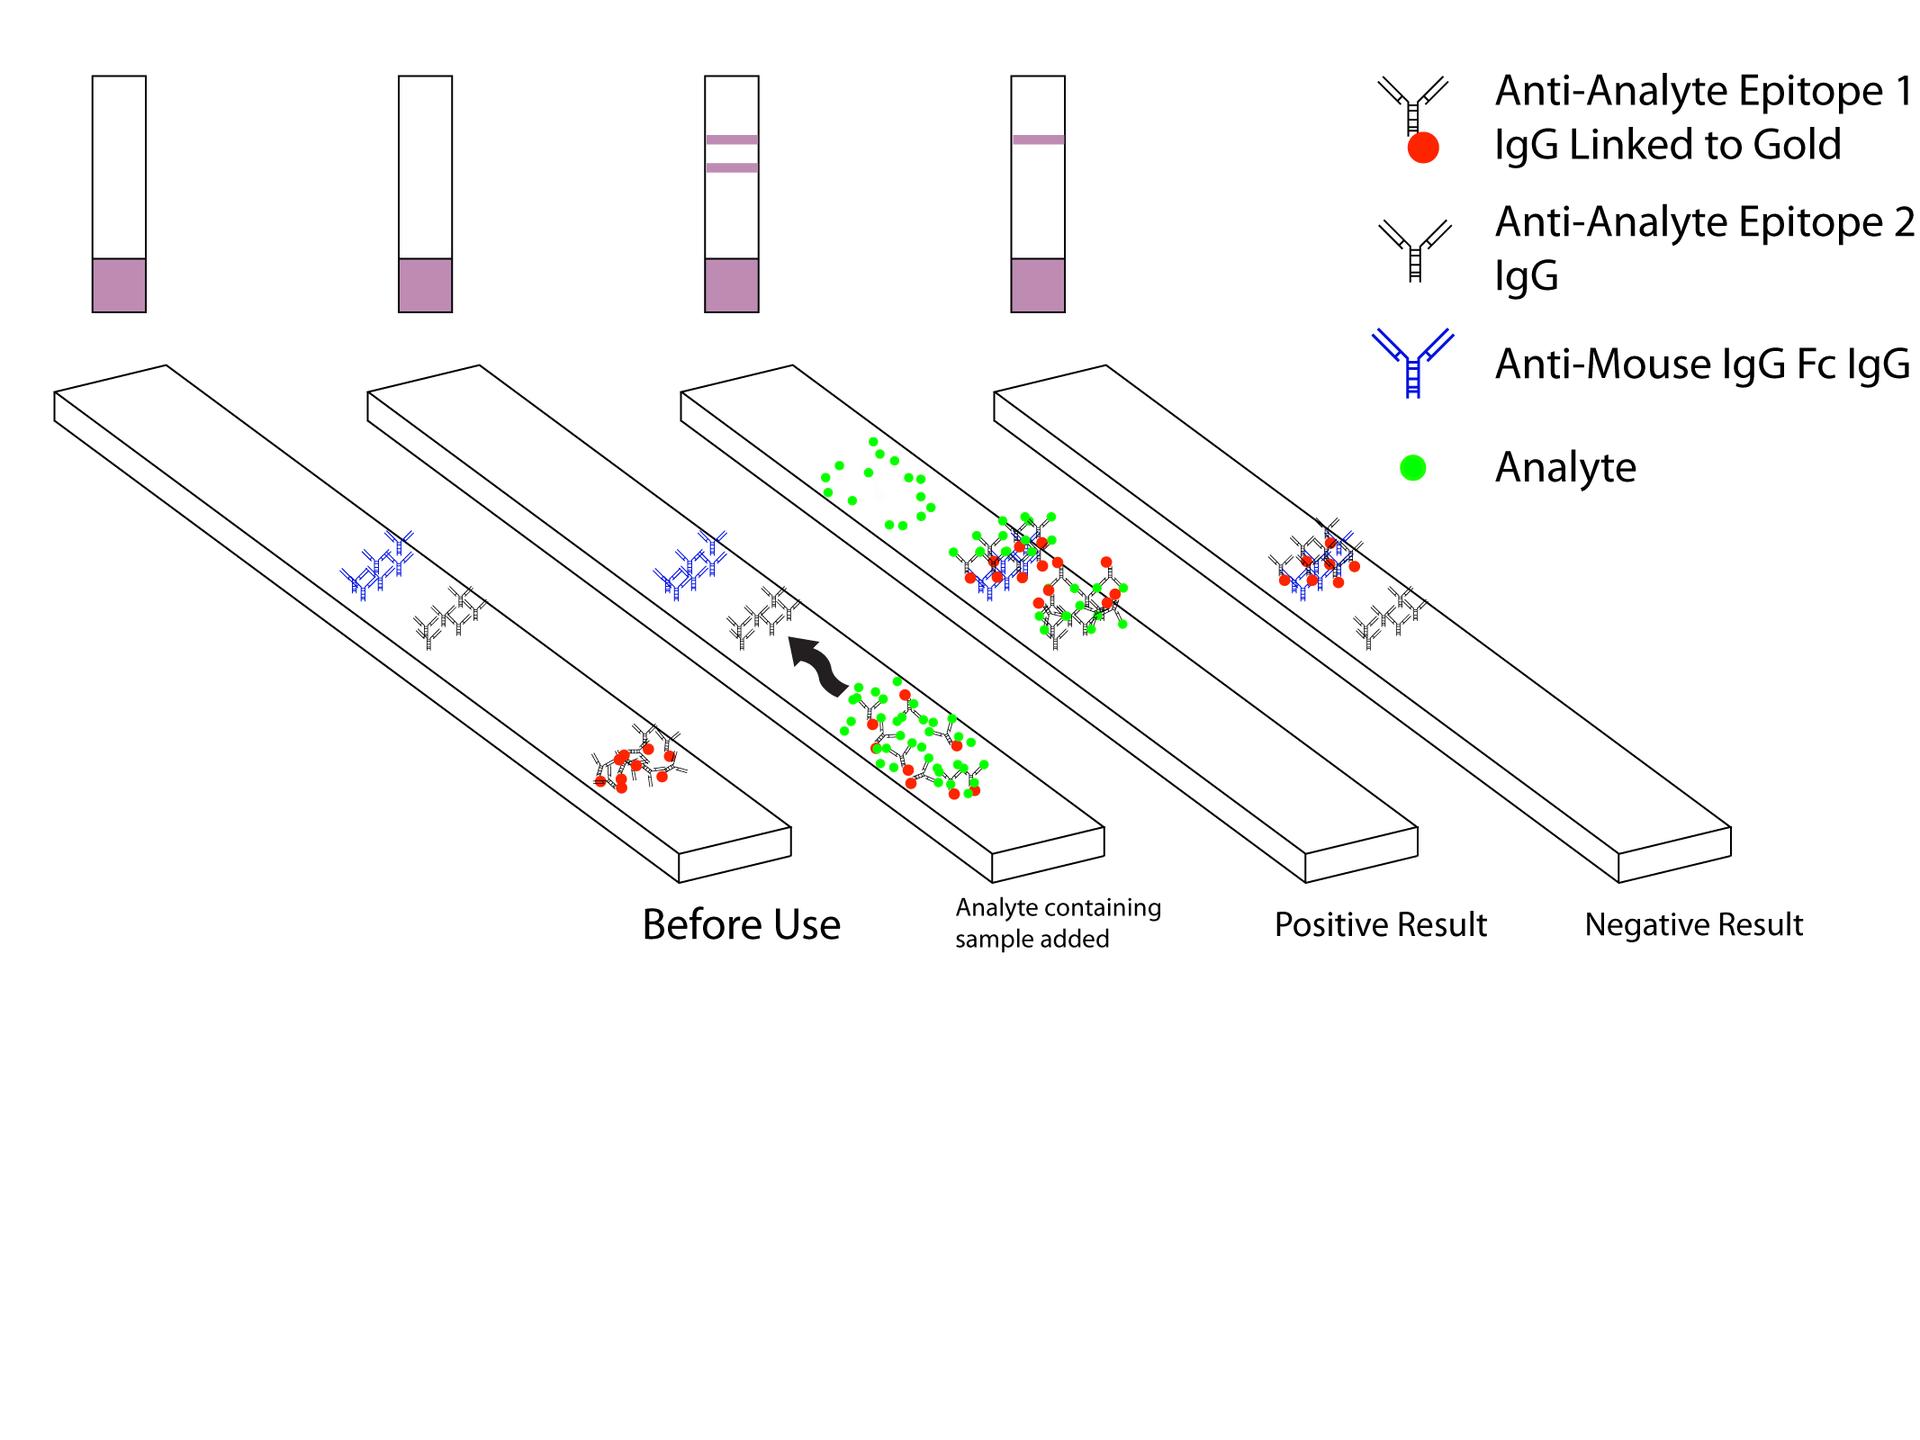 malaria antigen detection tests